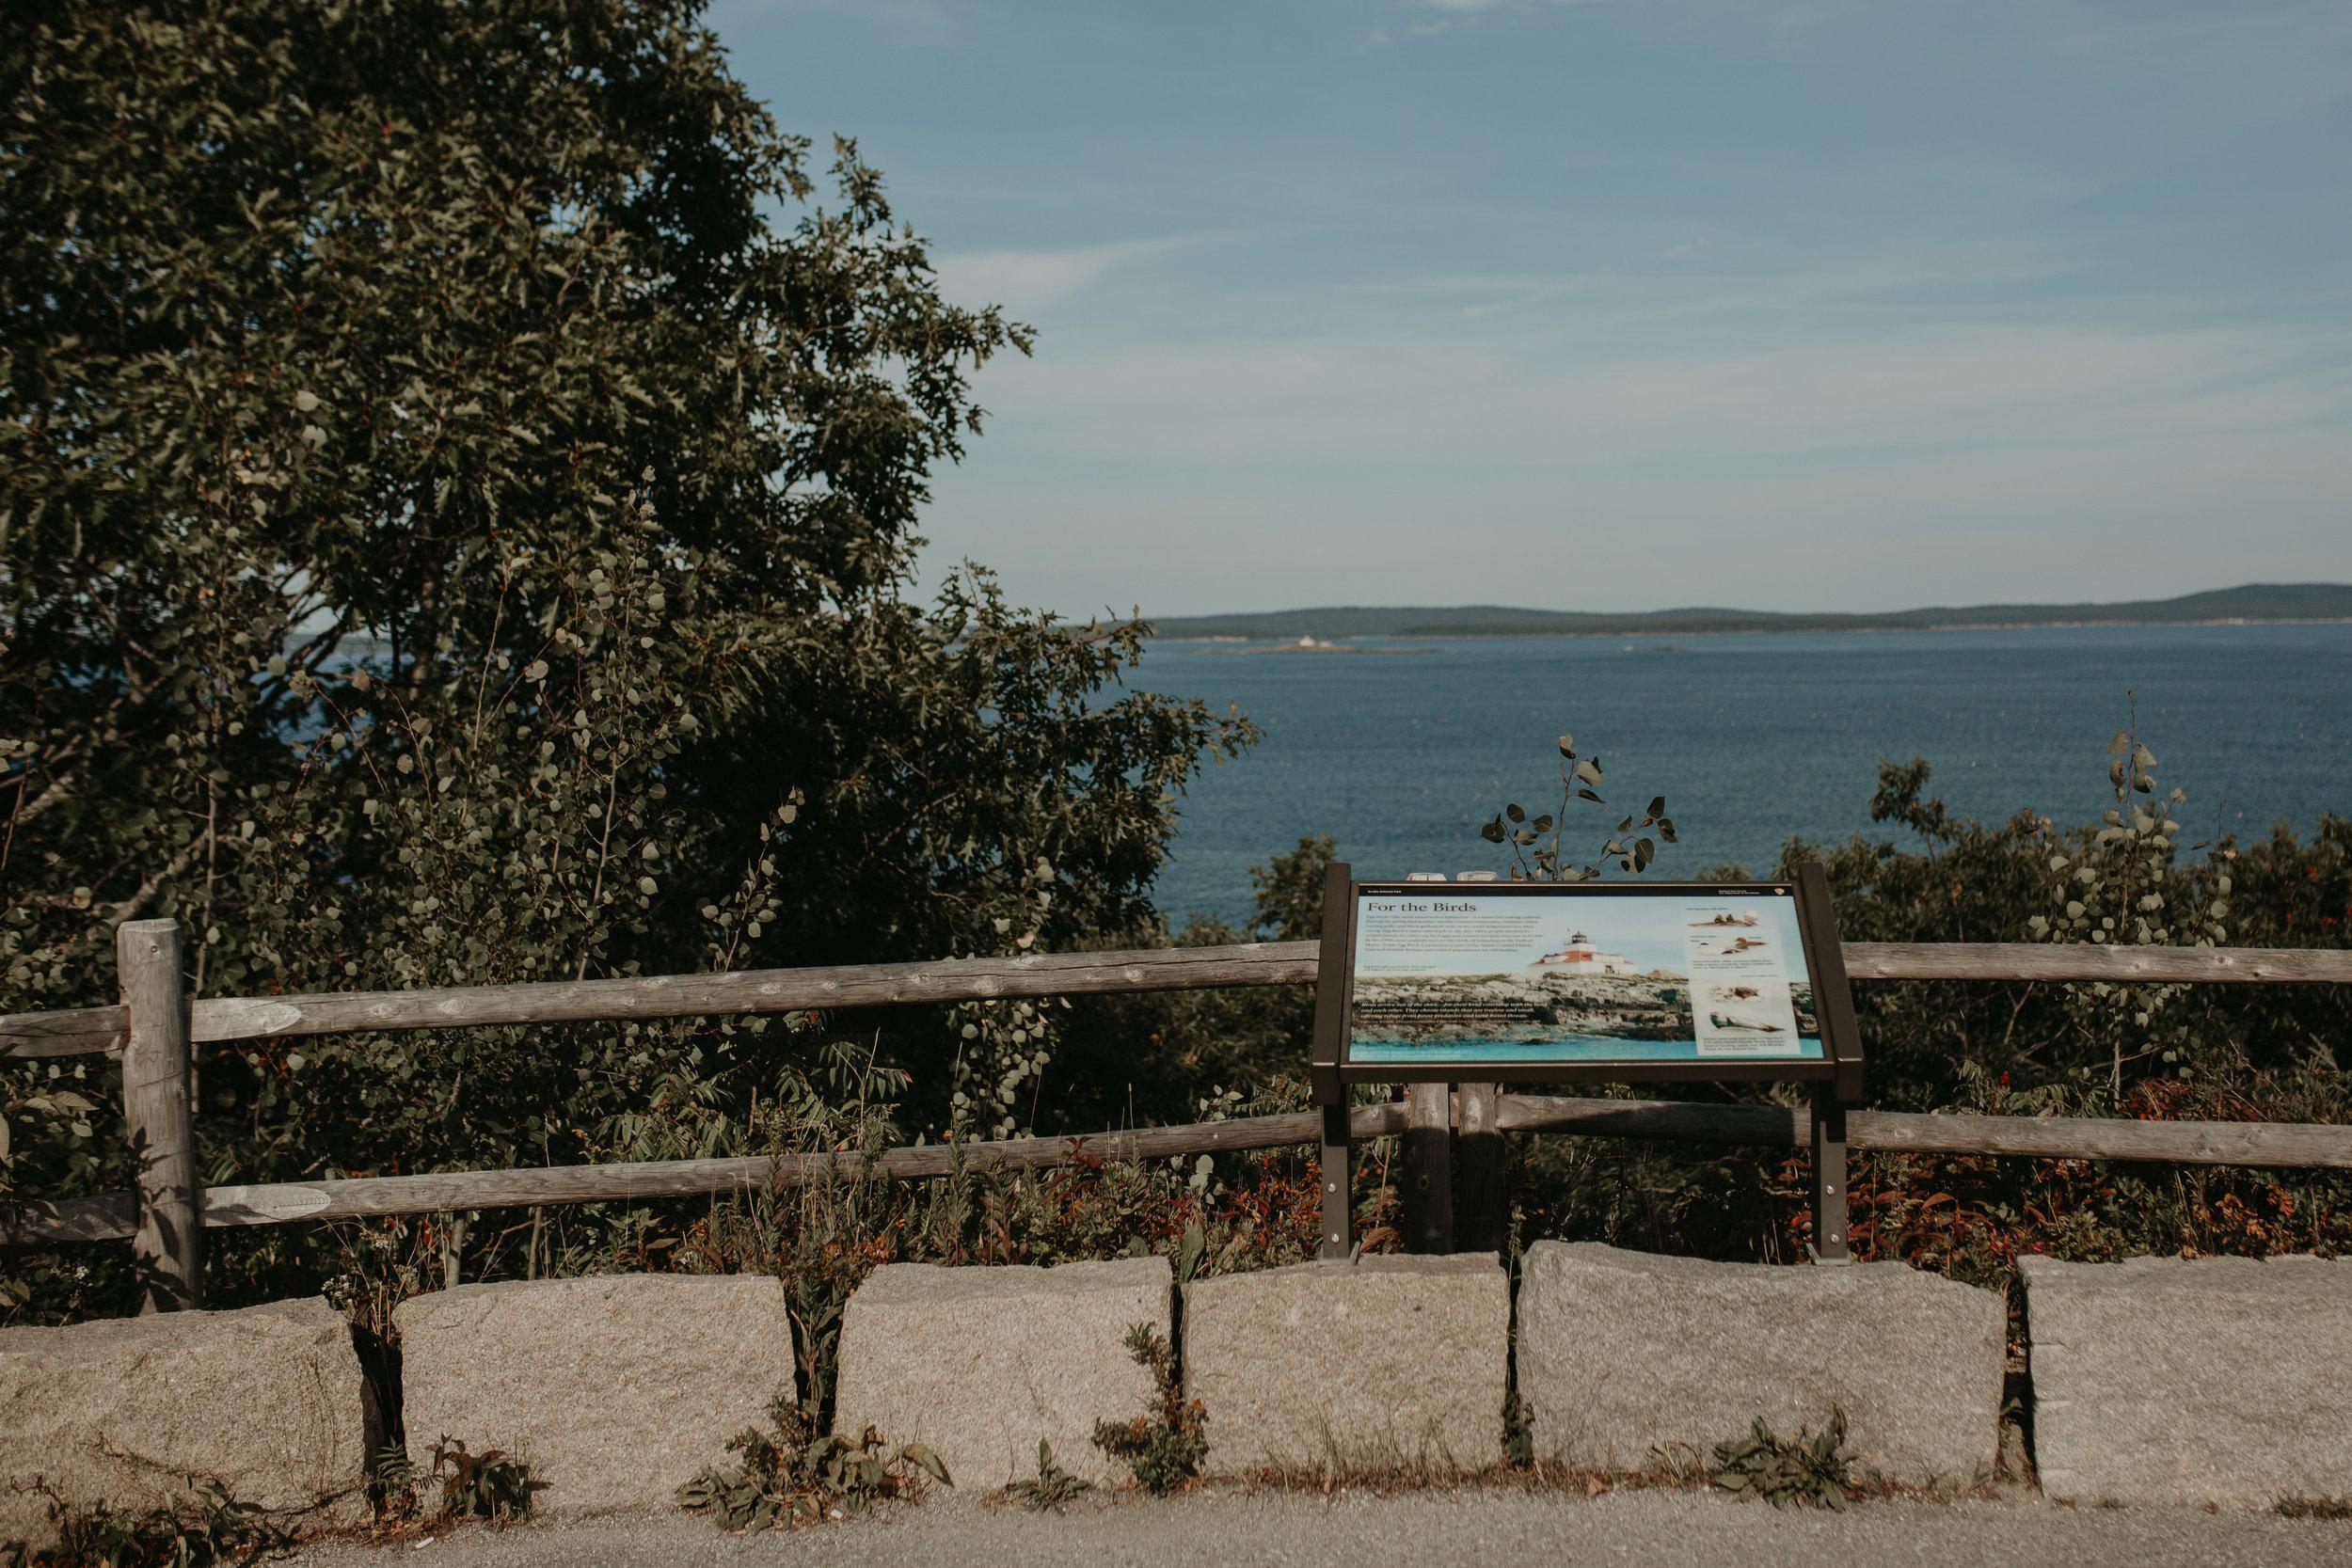 nicole-daacke-photography-Elopement-rocky-shoreline-coast-Acadia-National-Park-elopement-photographer-inspiration-maine-elopement-otter-cliffs-schoonic-head-point-11.jpg